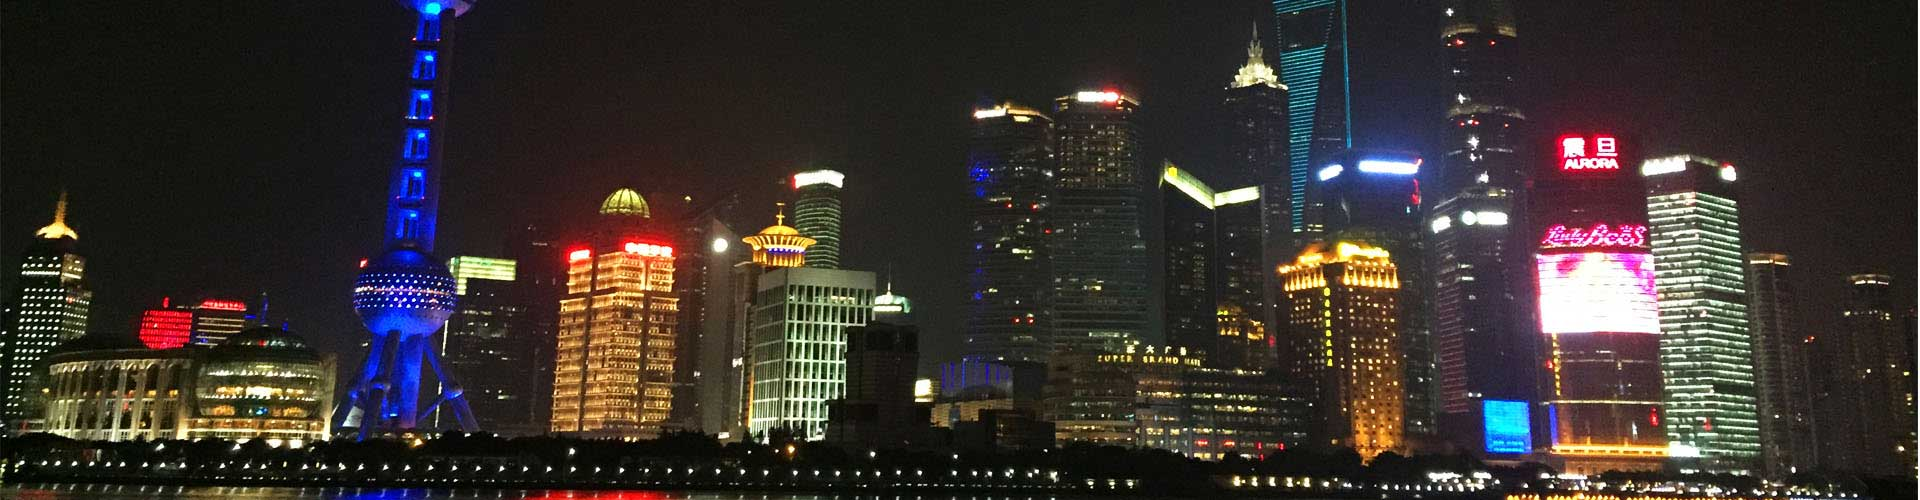 noche de Shanghai